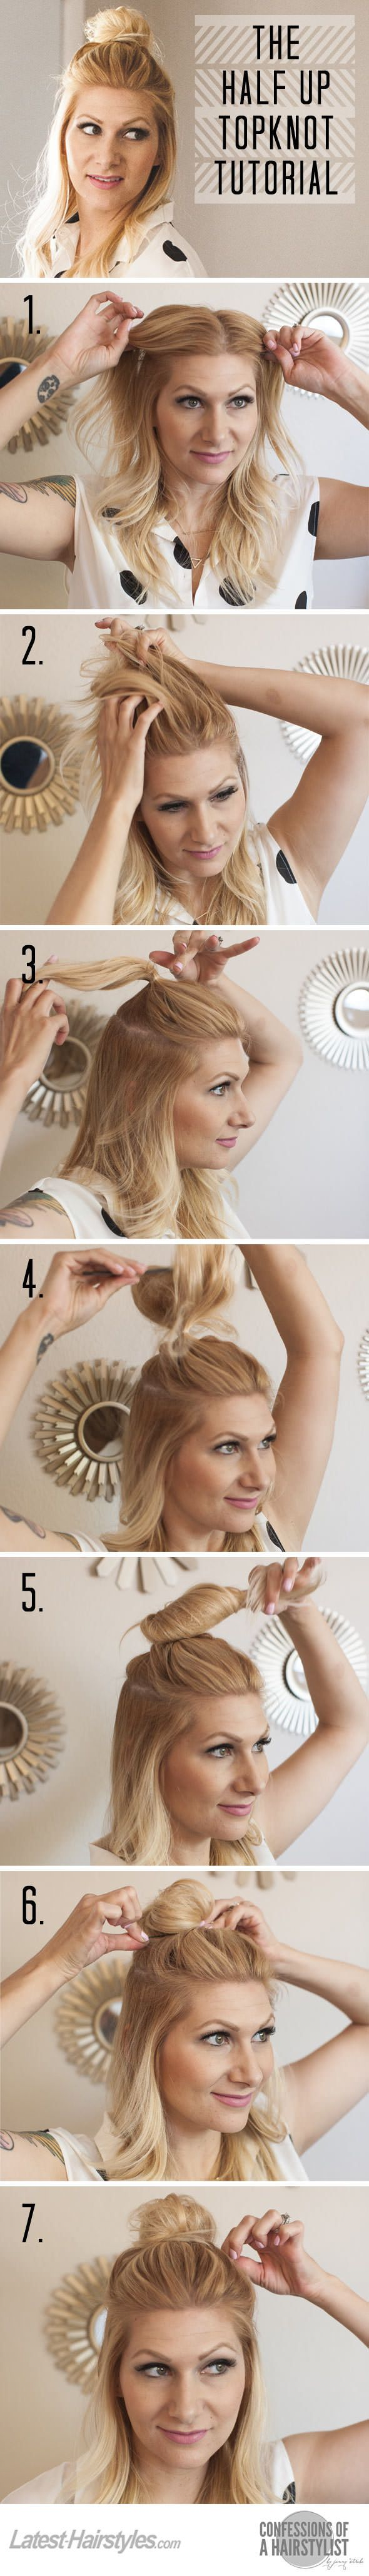 Superb 1000 Ideas About Topknot Tutorial On Pinterest Natural Blonde Short Hairstyles Gunalazisus